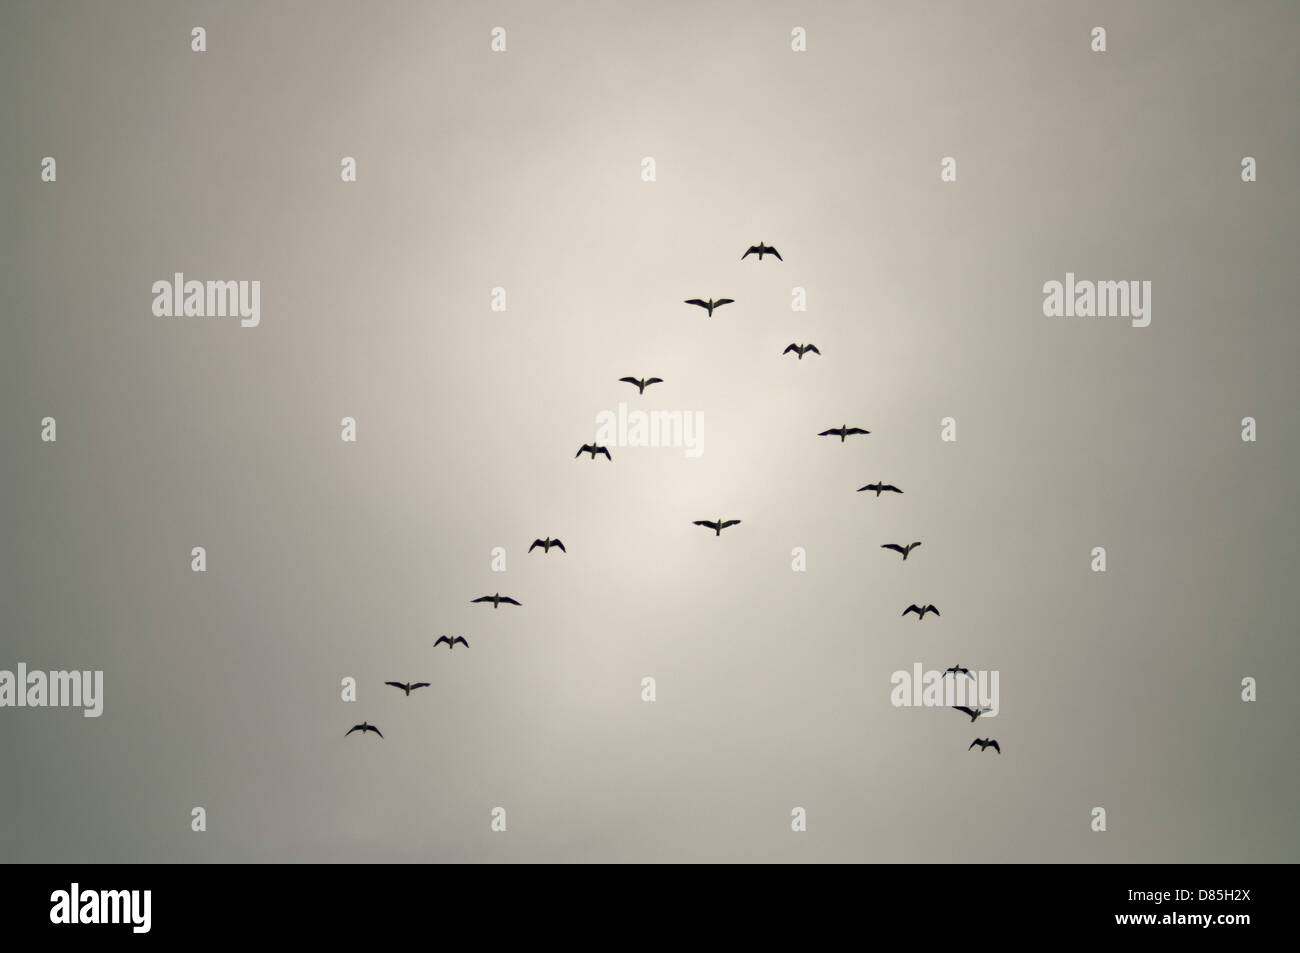 Aves en formación de flecha con un pájaro fuera de línea conceptual Imagen De Stock